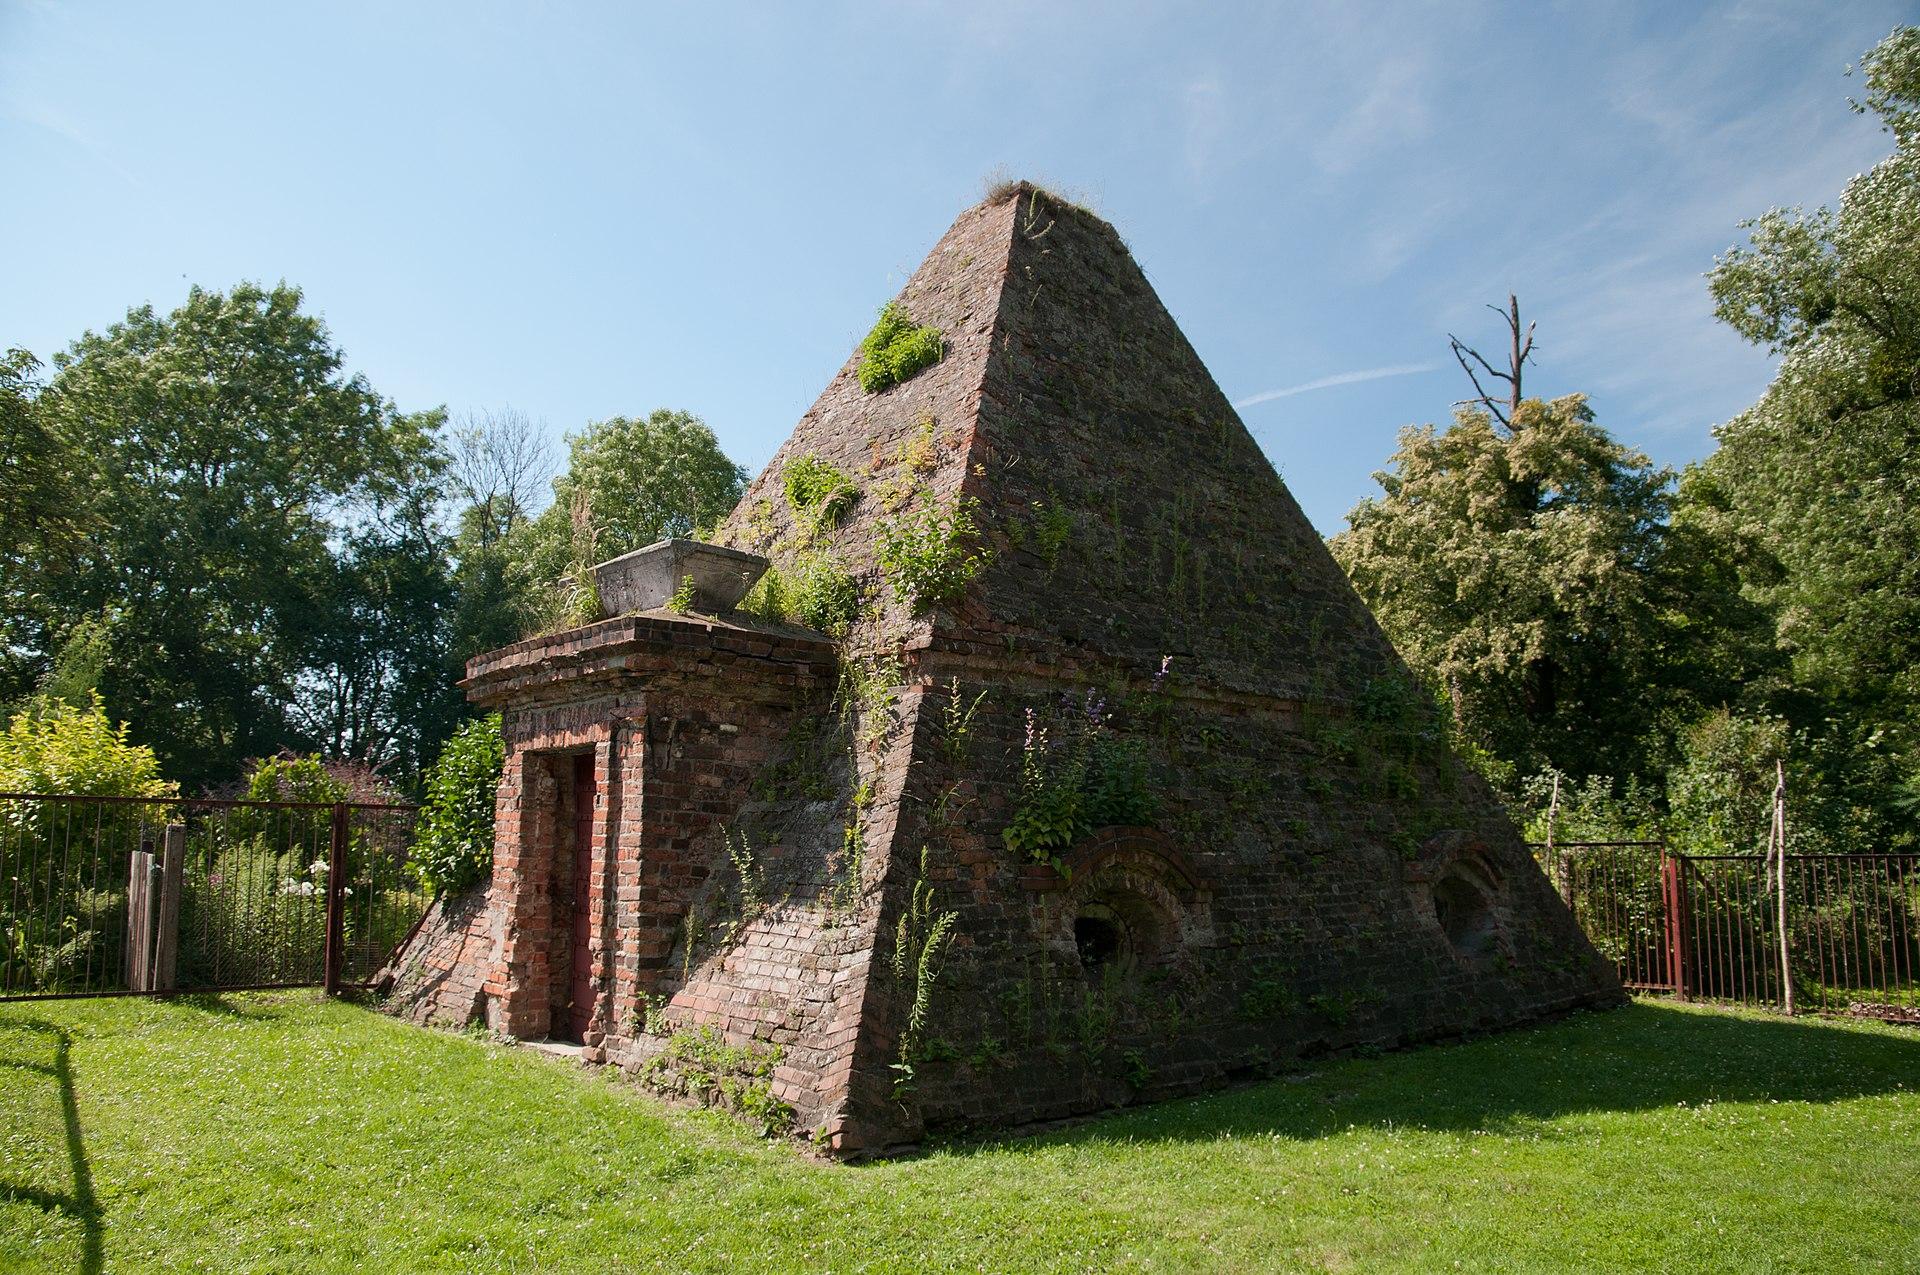 Pyramidengrab ober rosen wikipedia - Mohring architekten ...